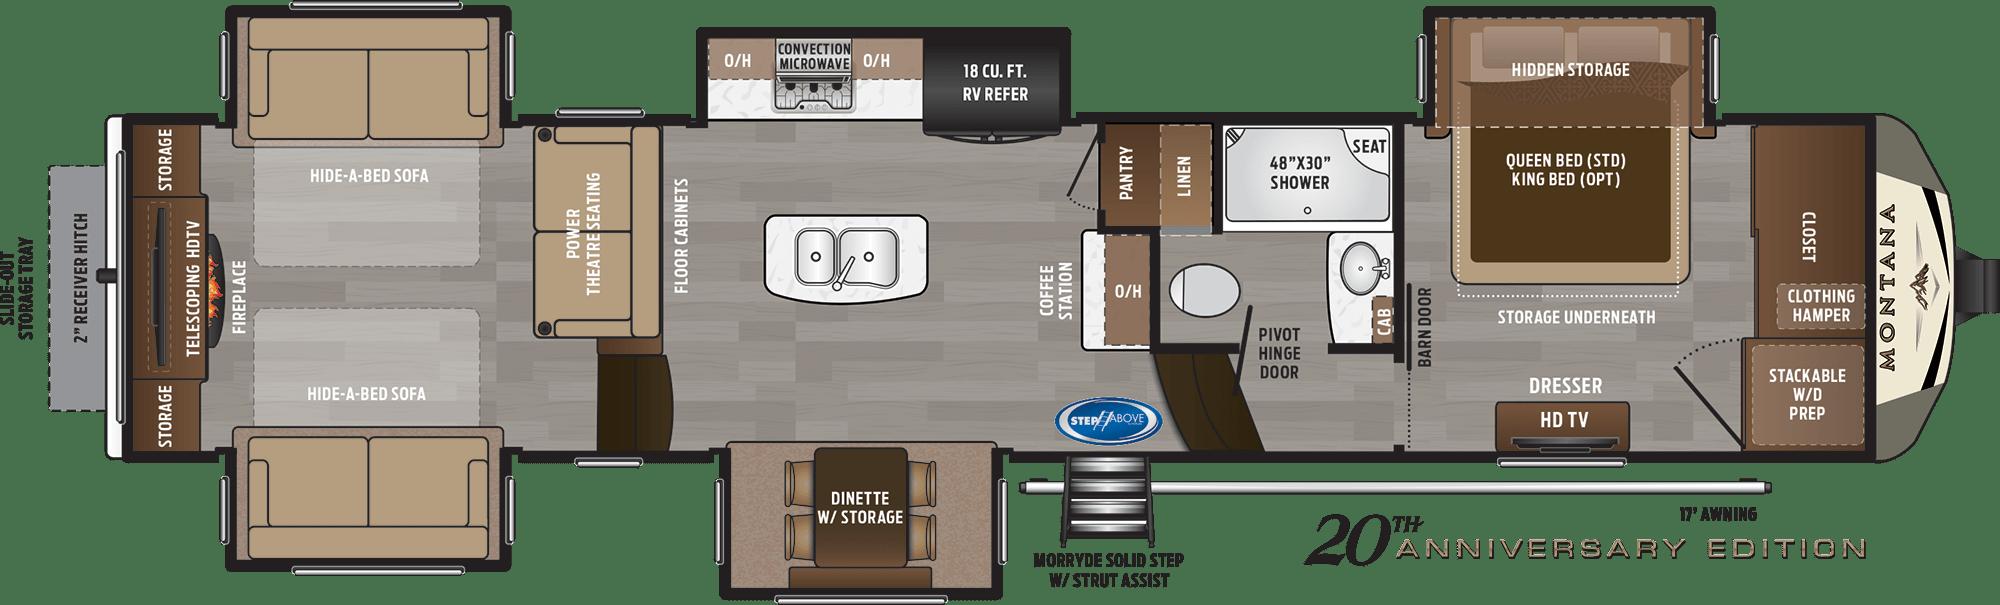 NEW 2019 Keystone MONTANA 3790RD - American RV